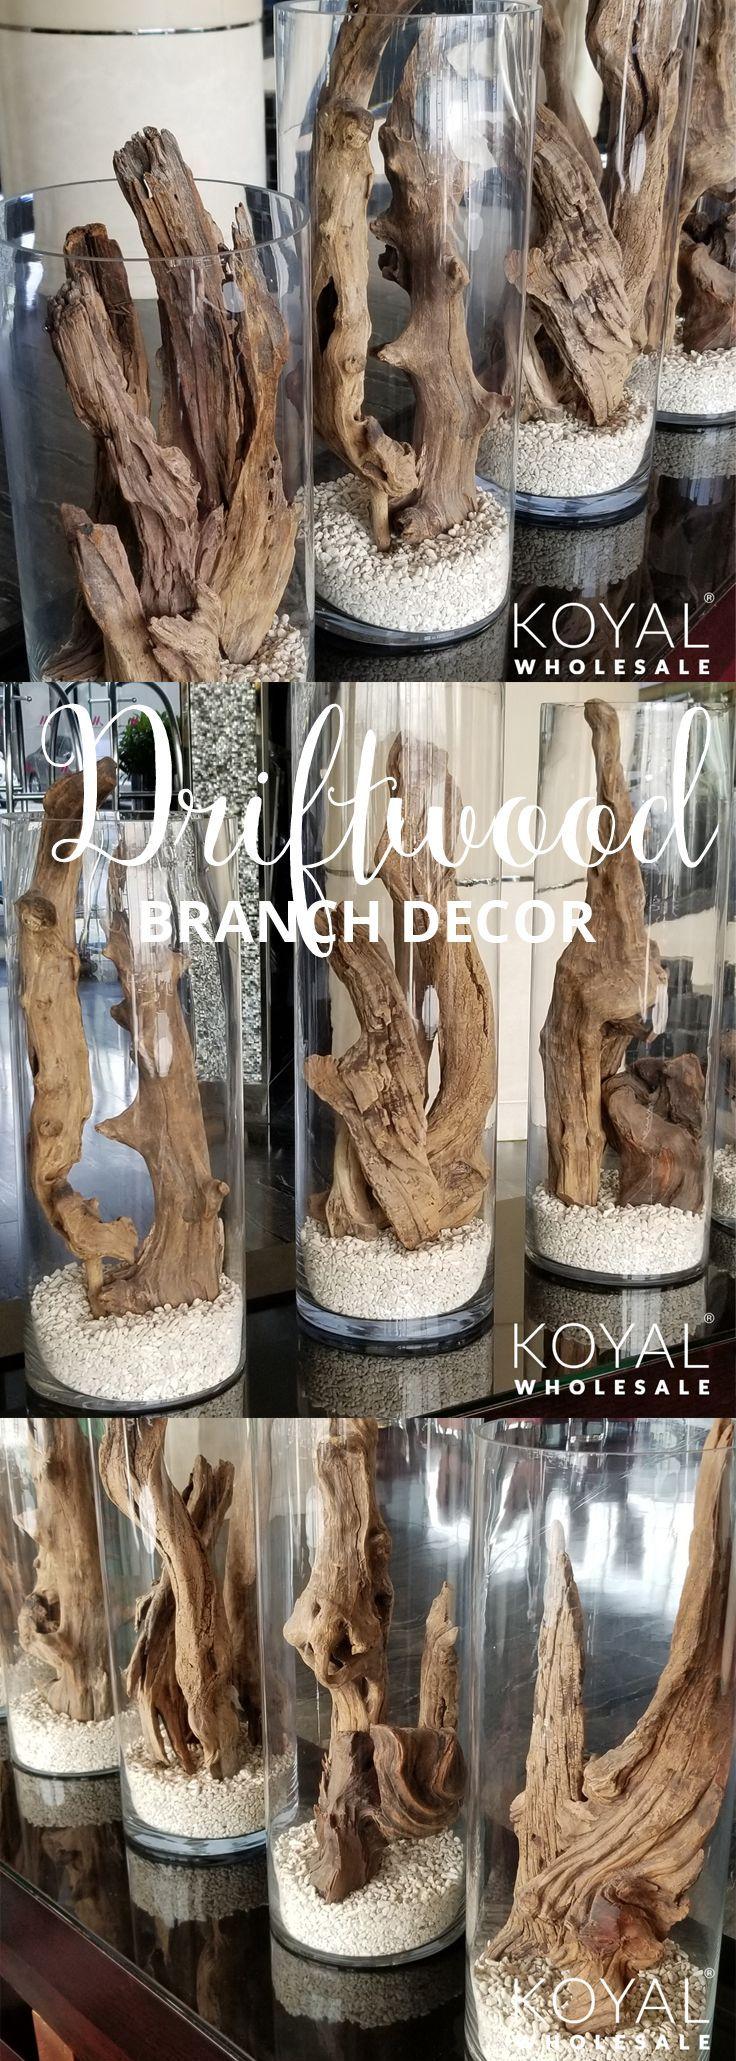 Driftwood Branches Decor Ideas & Inspiration